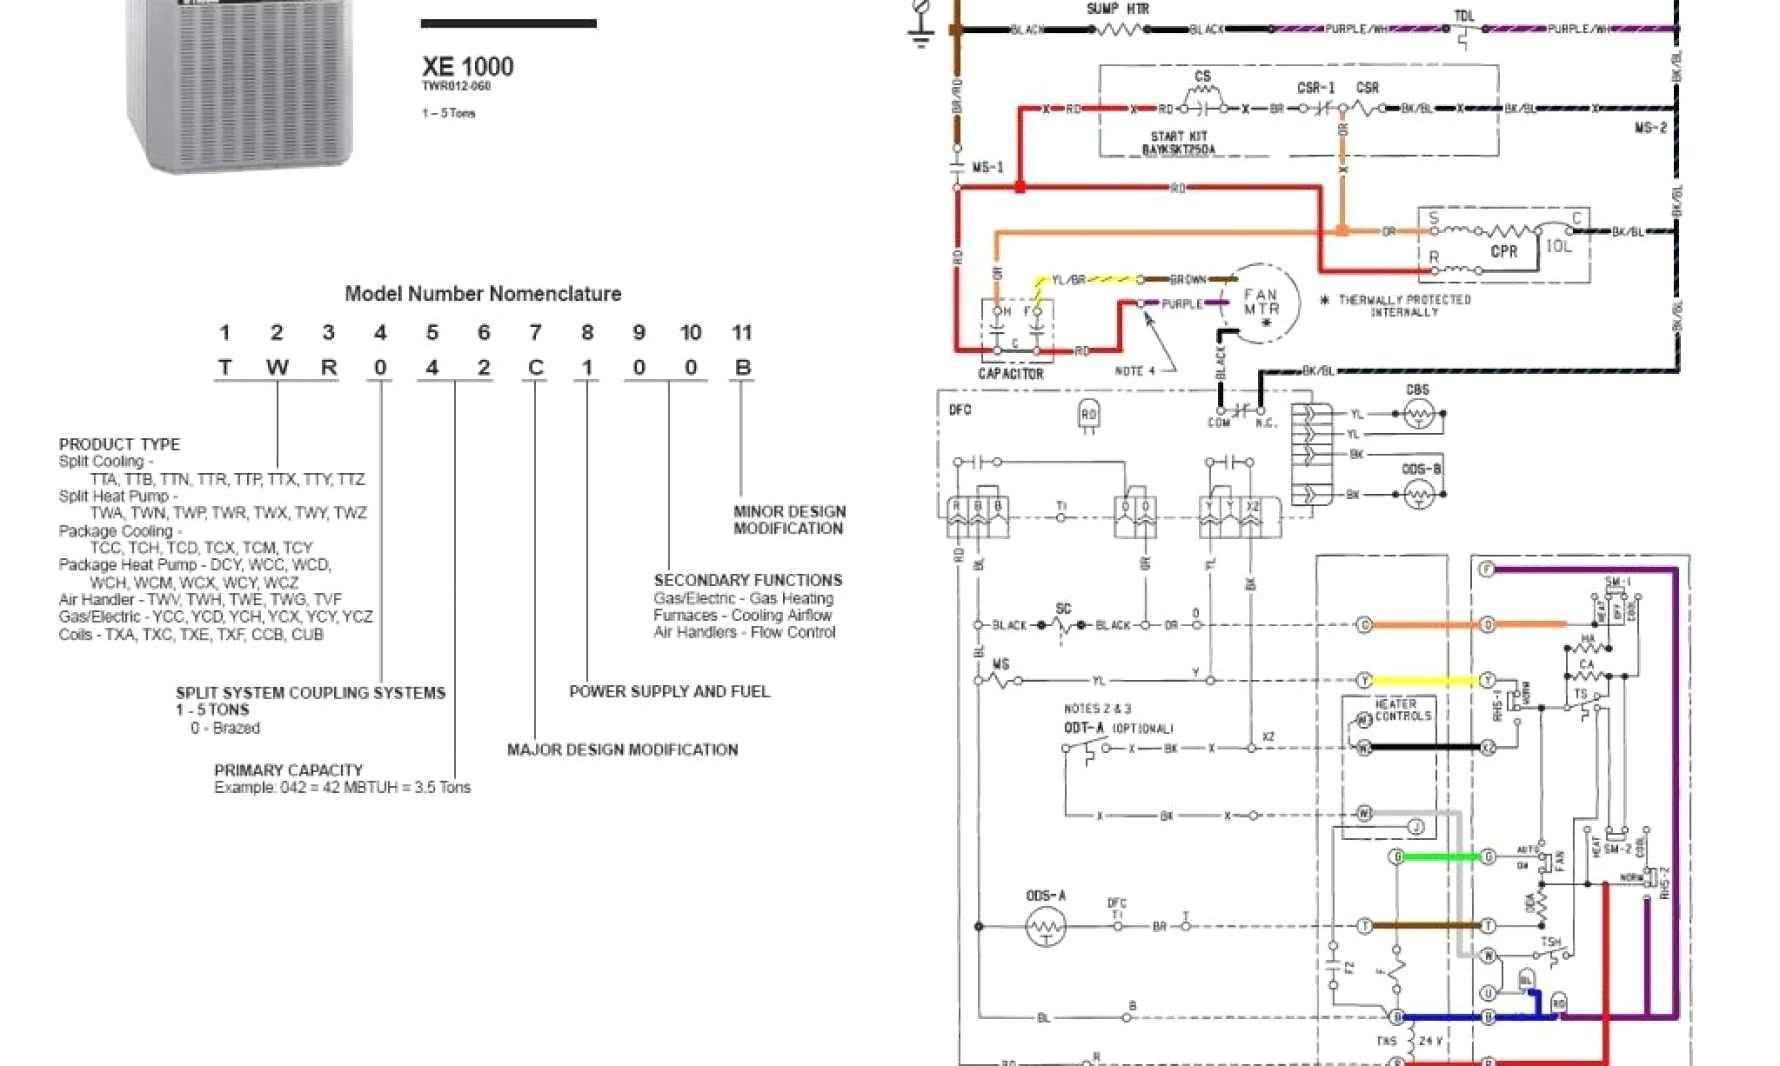 hight resolution of trane furnace wiring diagram trane thermostat wiring diagram collection trane thermostat wiring diagram new wiring